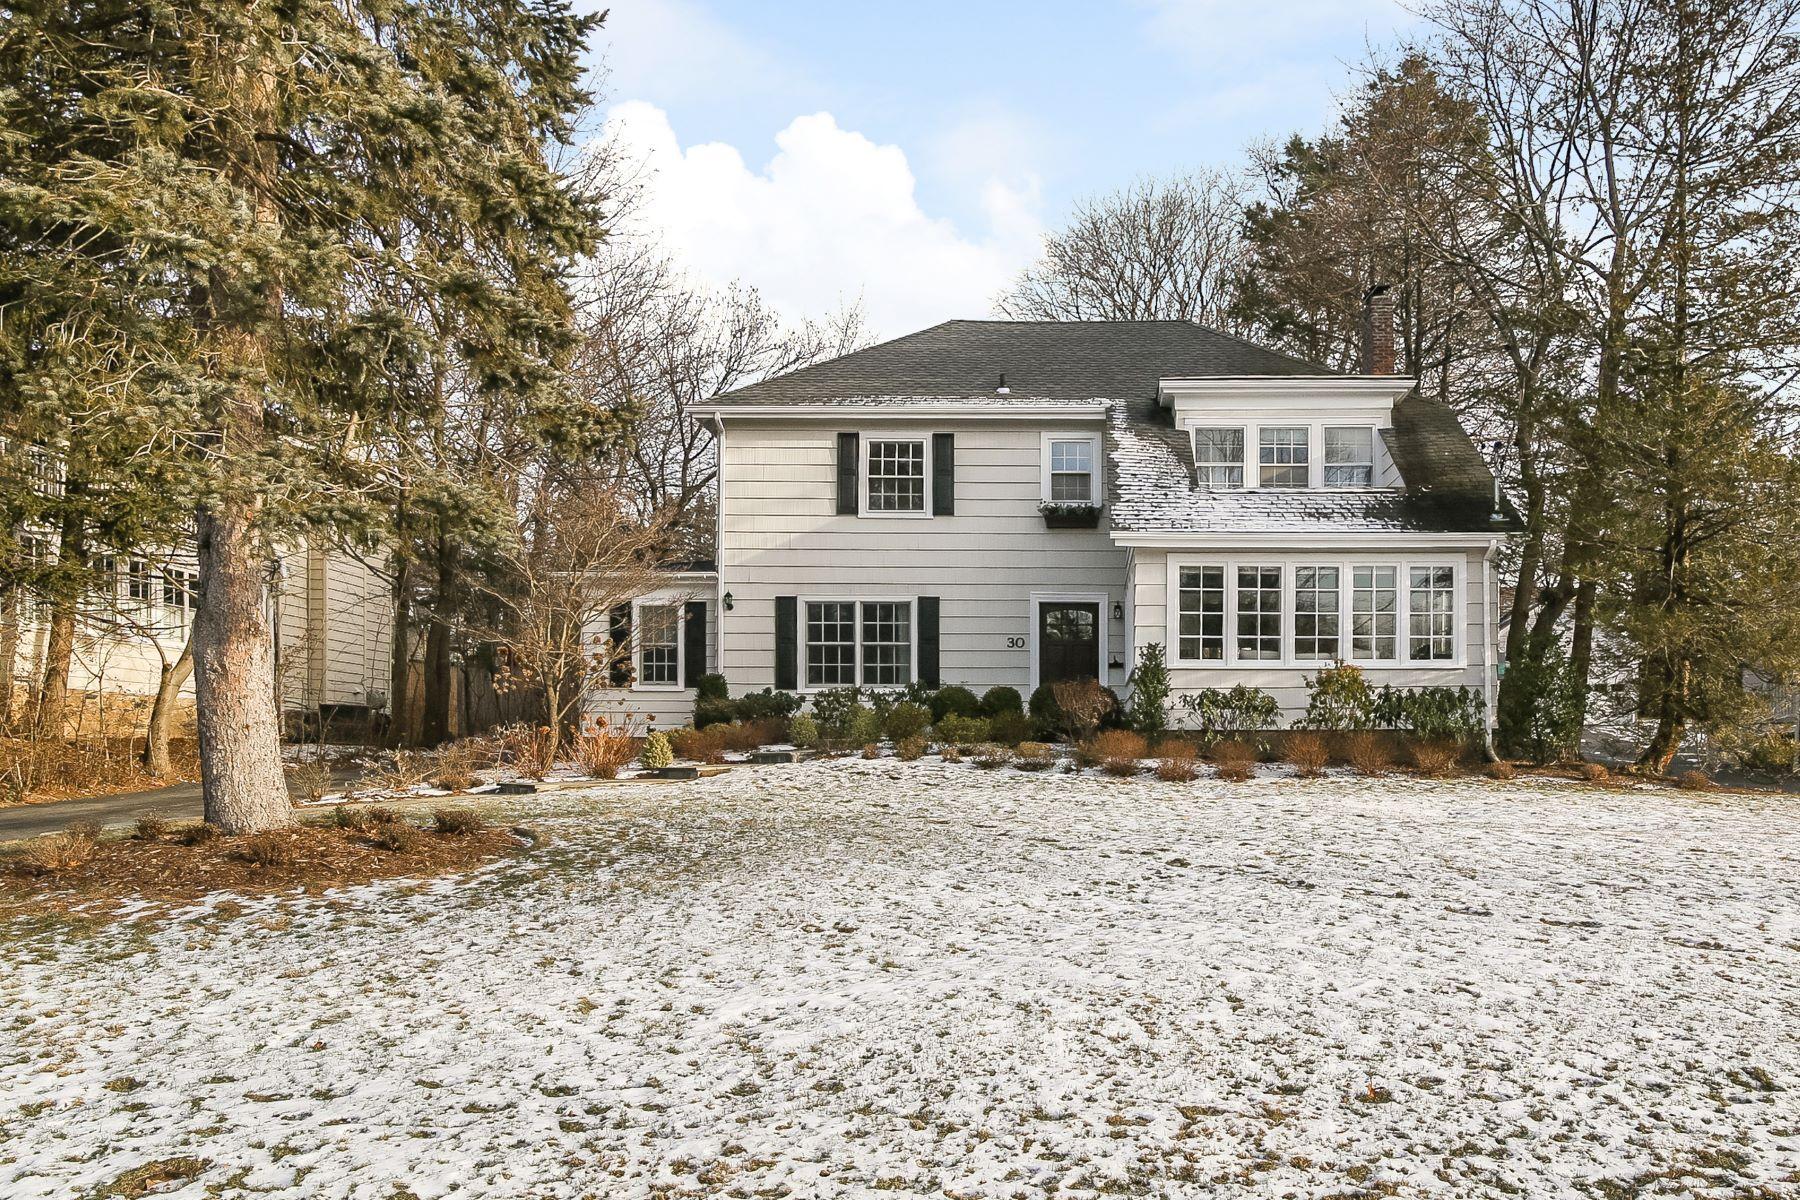 独户住宅 为 销售 在 Beautiful Sunny Expanded & Renovated Colonial 30 Montrose Road, 斯卡斯代尔, 纽约州, 10583 美国